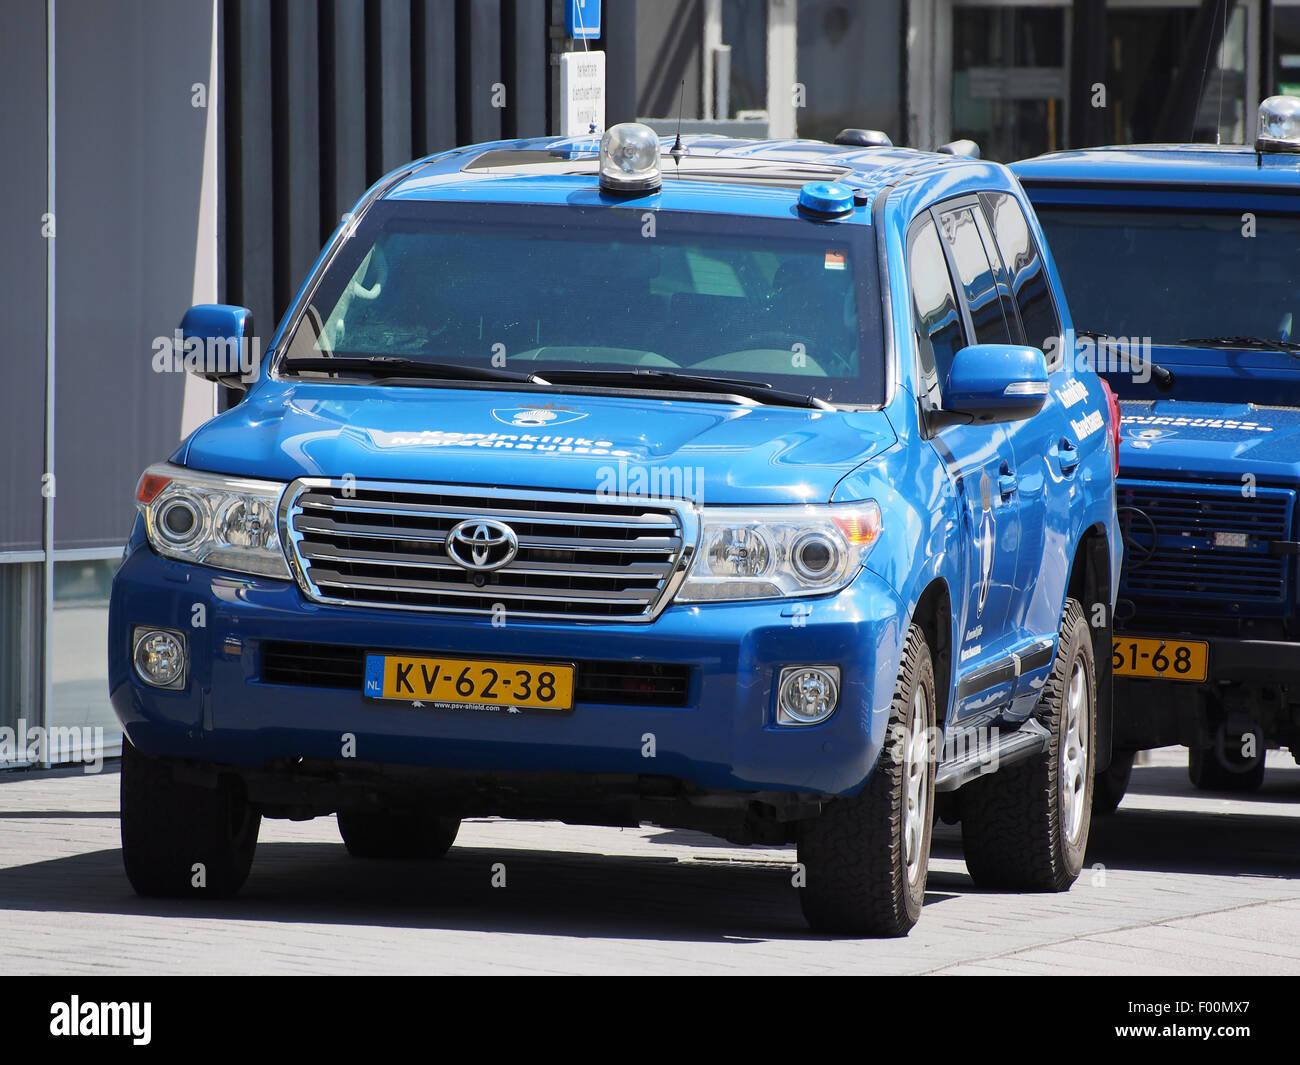 Toyota Koninklijke Marechaussee, Schiphol pic1 - Stock Image